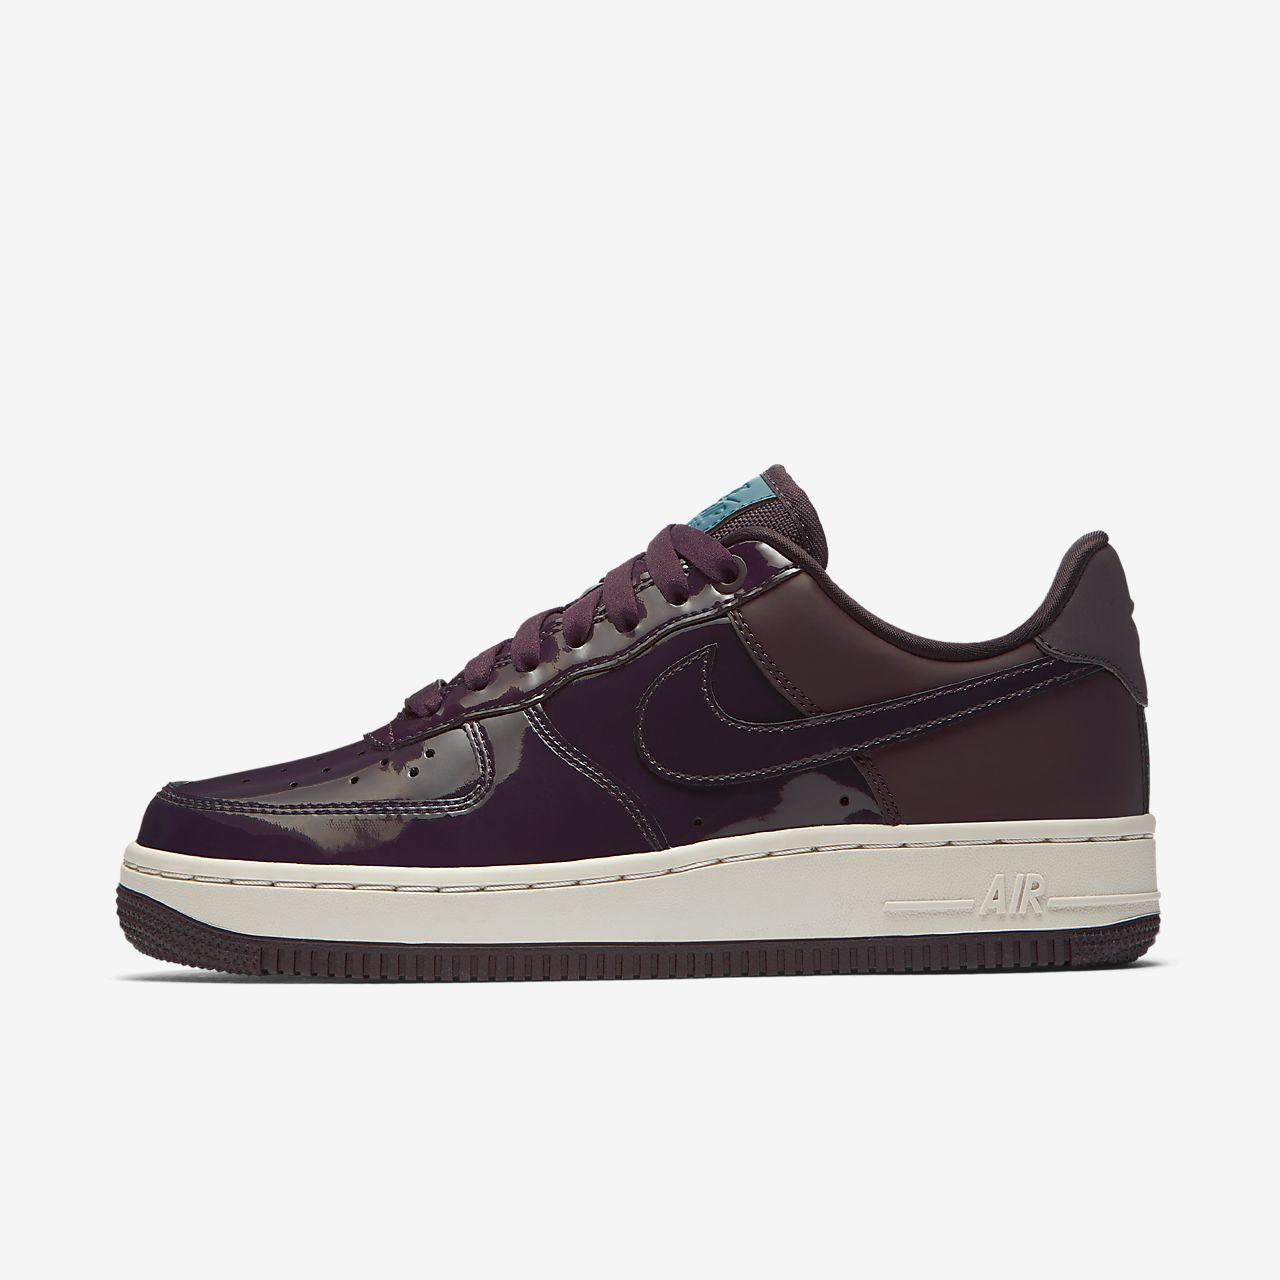 Nike Air Force 1 '07 SE Premium Premium Premium Force Is Female Damenschuh    | Quality First  779b95